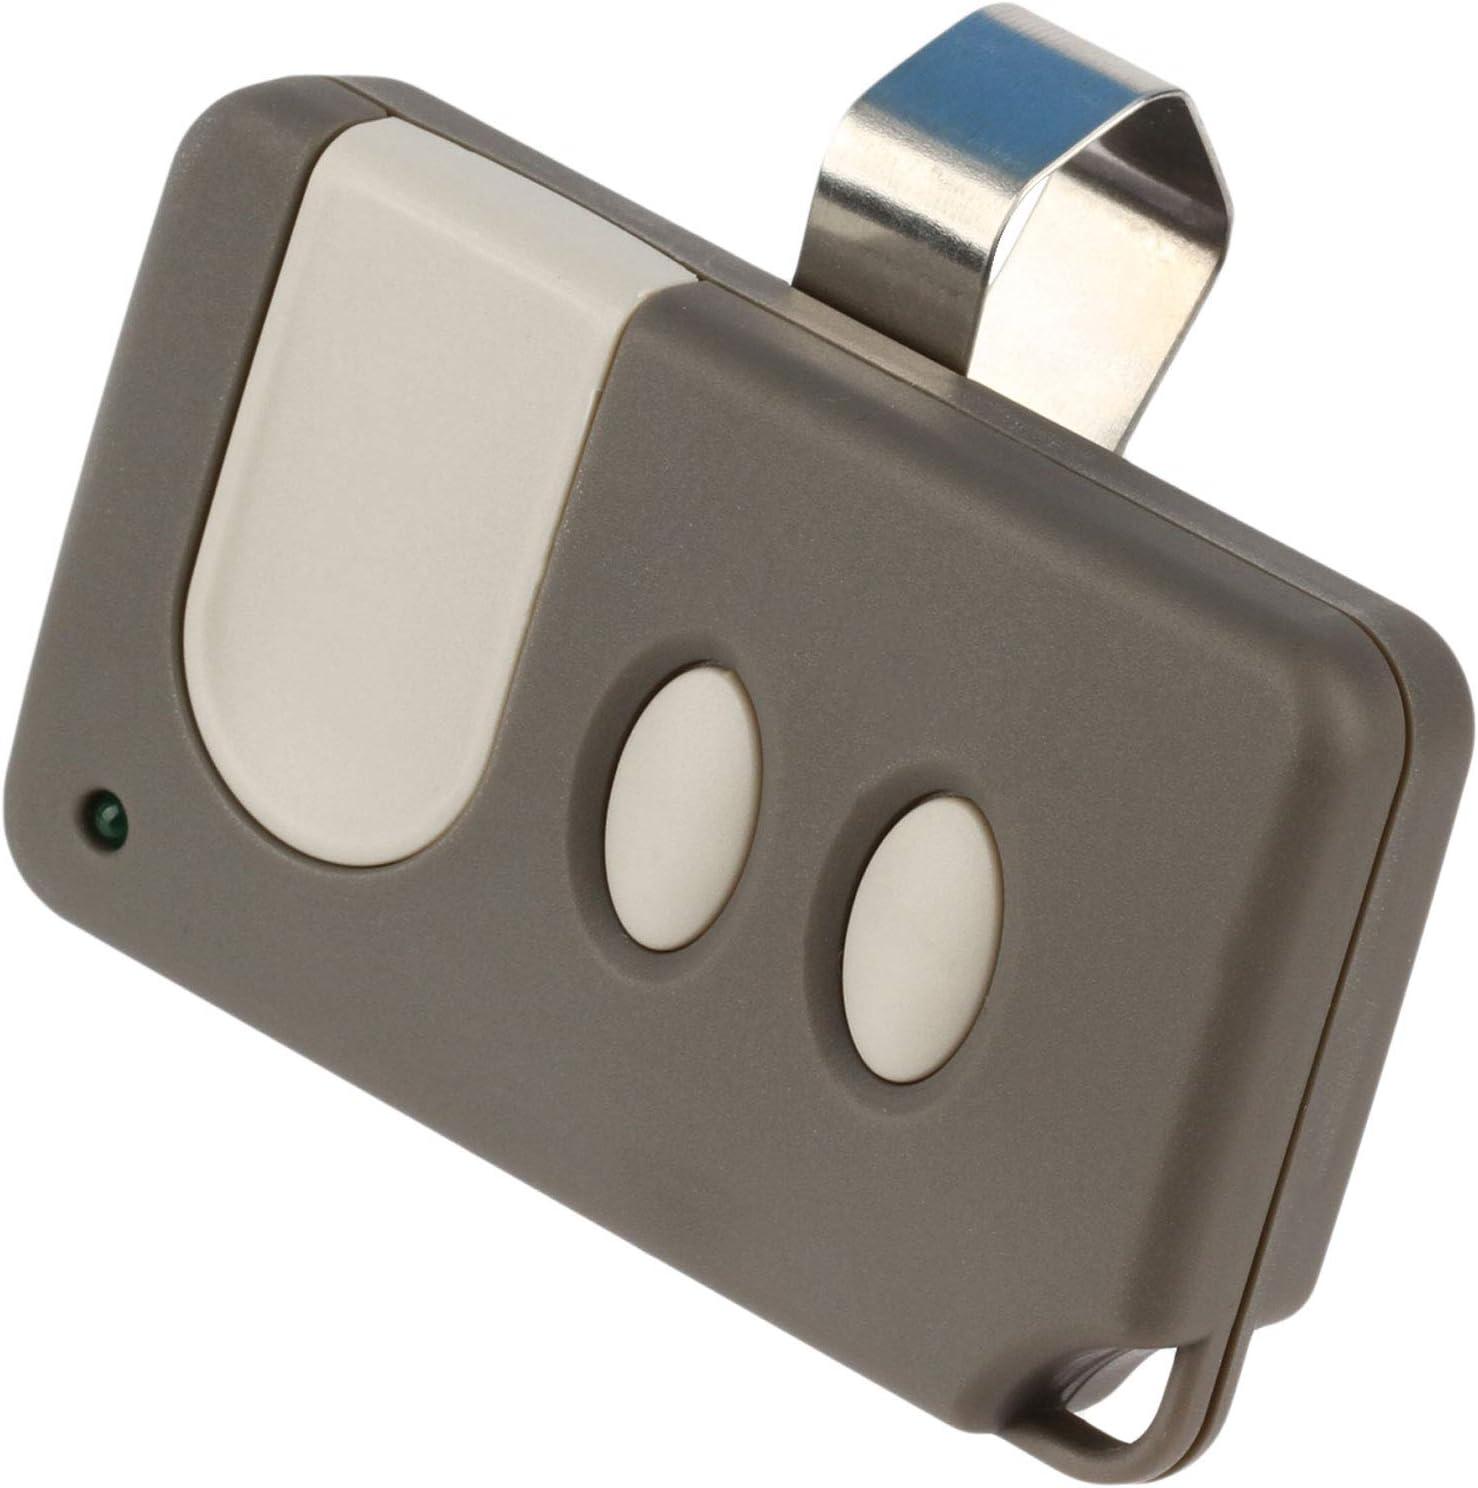 2 For Sears Craftsman Garage Door Opener Remote Control 3 ...